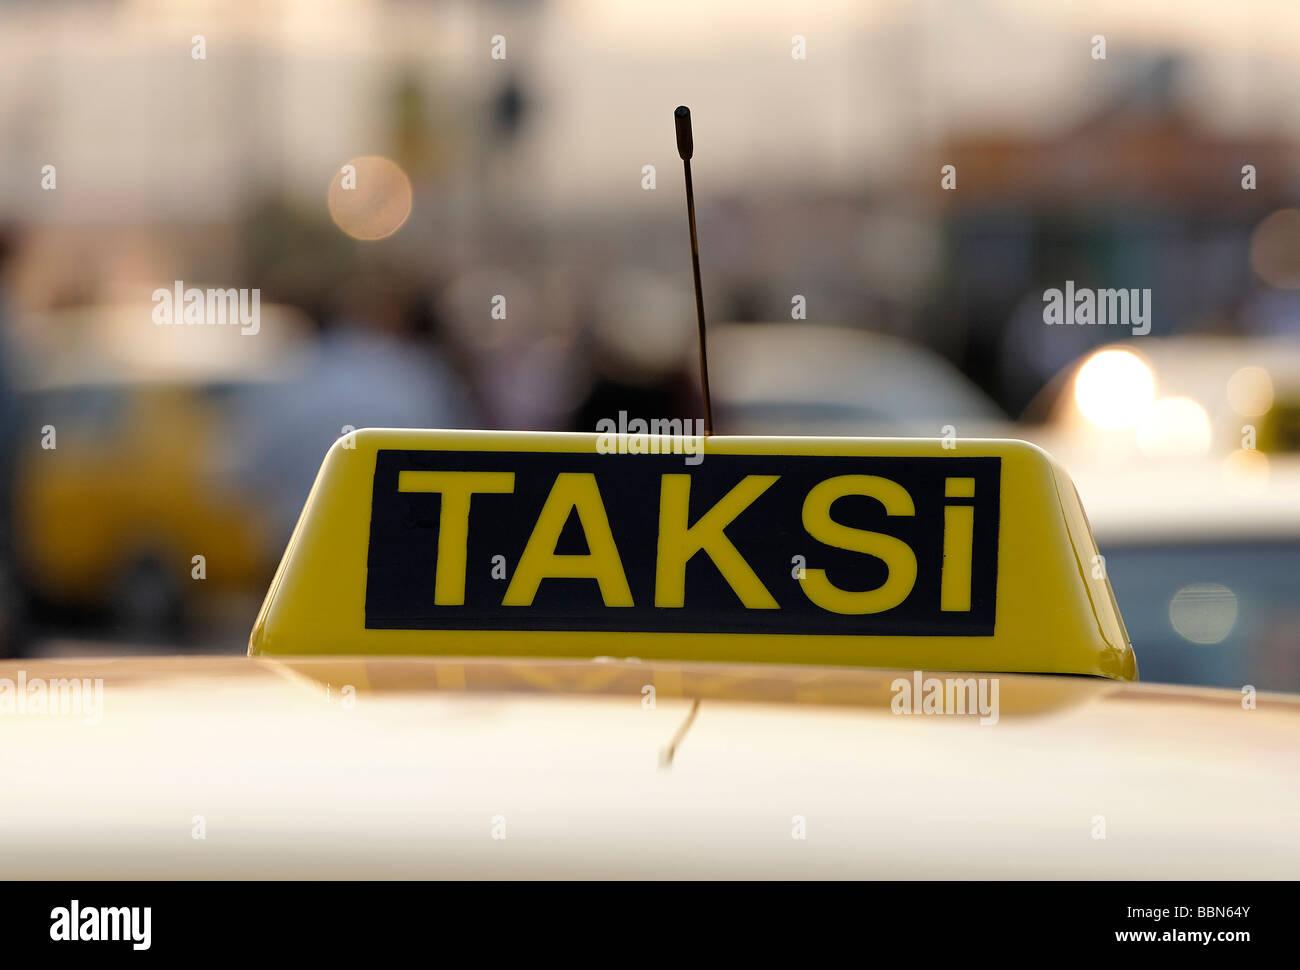 Turkish taxi sign on a car, Taksi, Eminoenue, Istanbul, Turkey - Stock Image